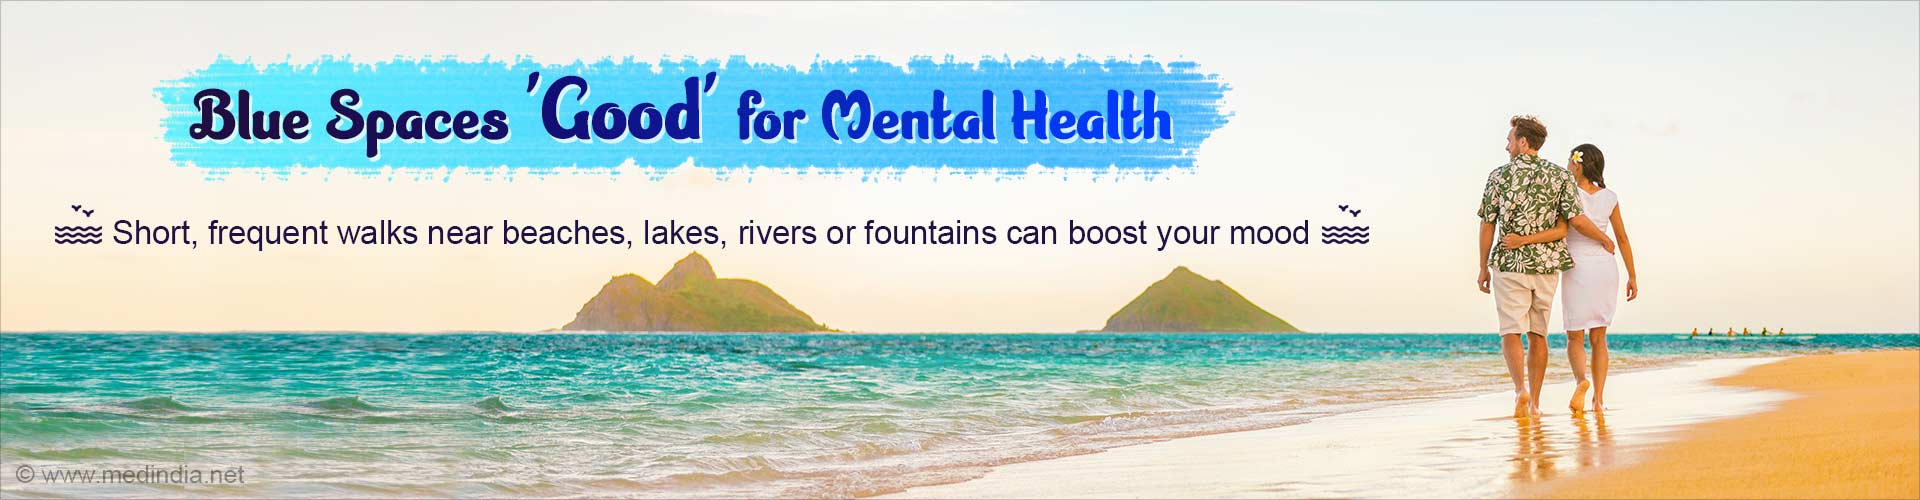 Walking Along Blue Spaces Benefits Mental Health